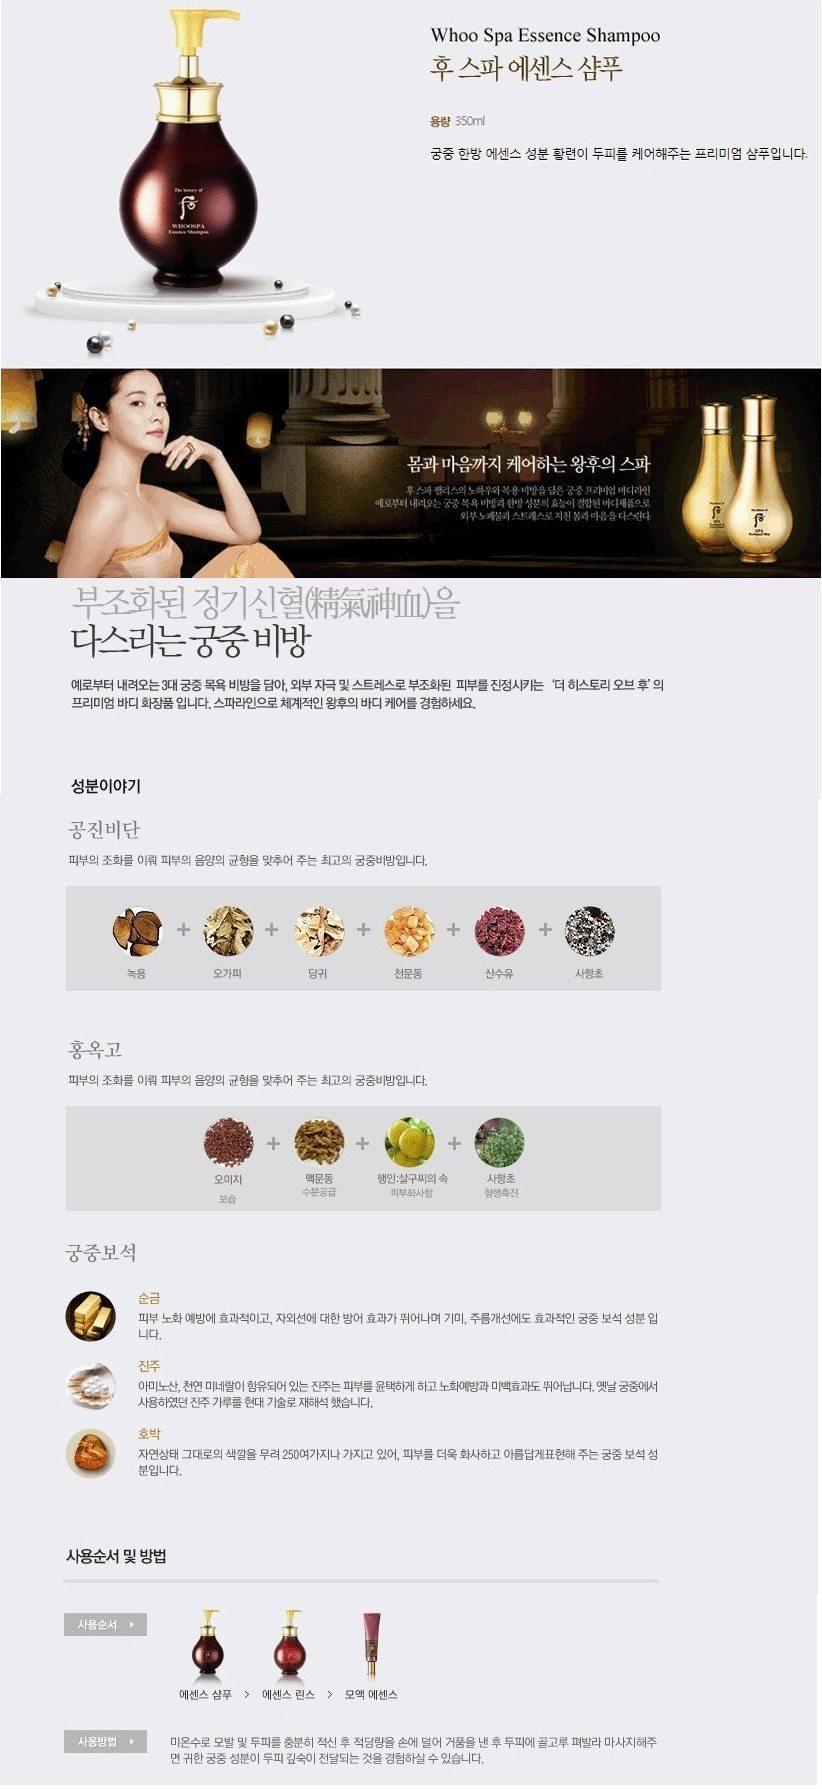 The History Of Whoo WhooSpa Essence Shampoo korean cosmetic skincare body hair product online shop malaysia thailand macau1